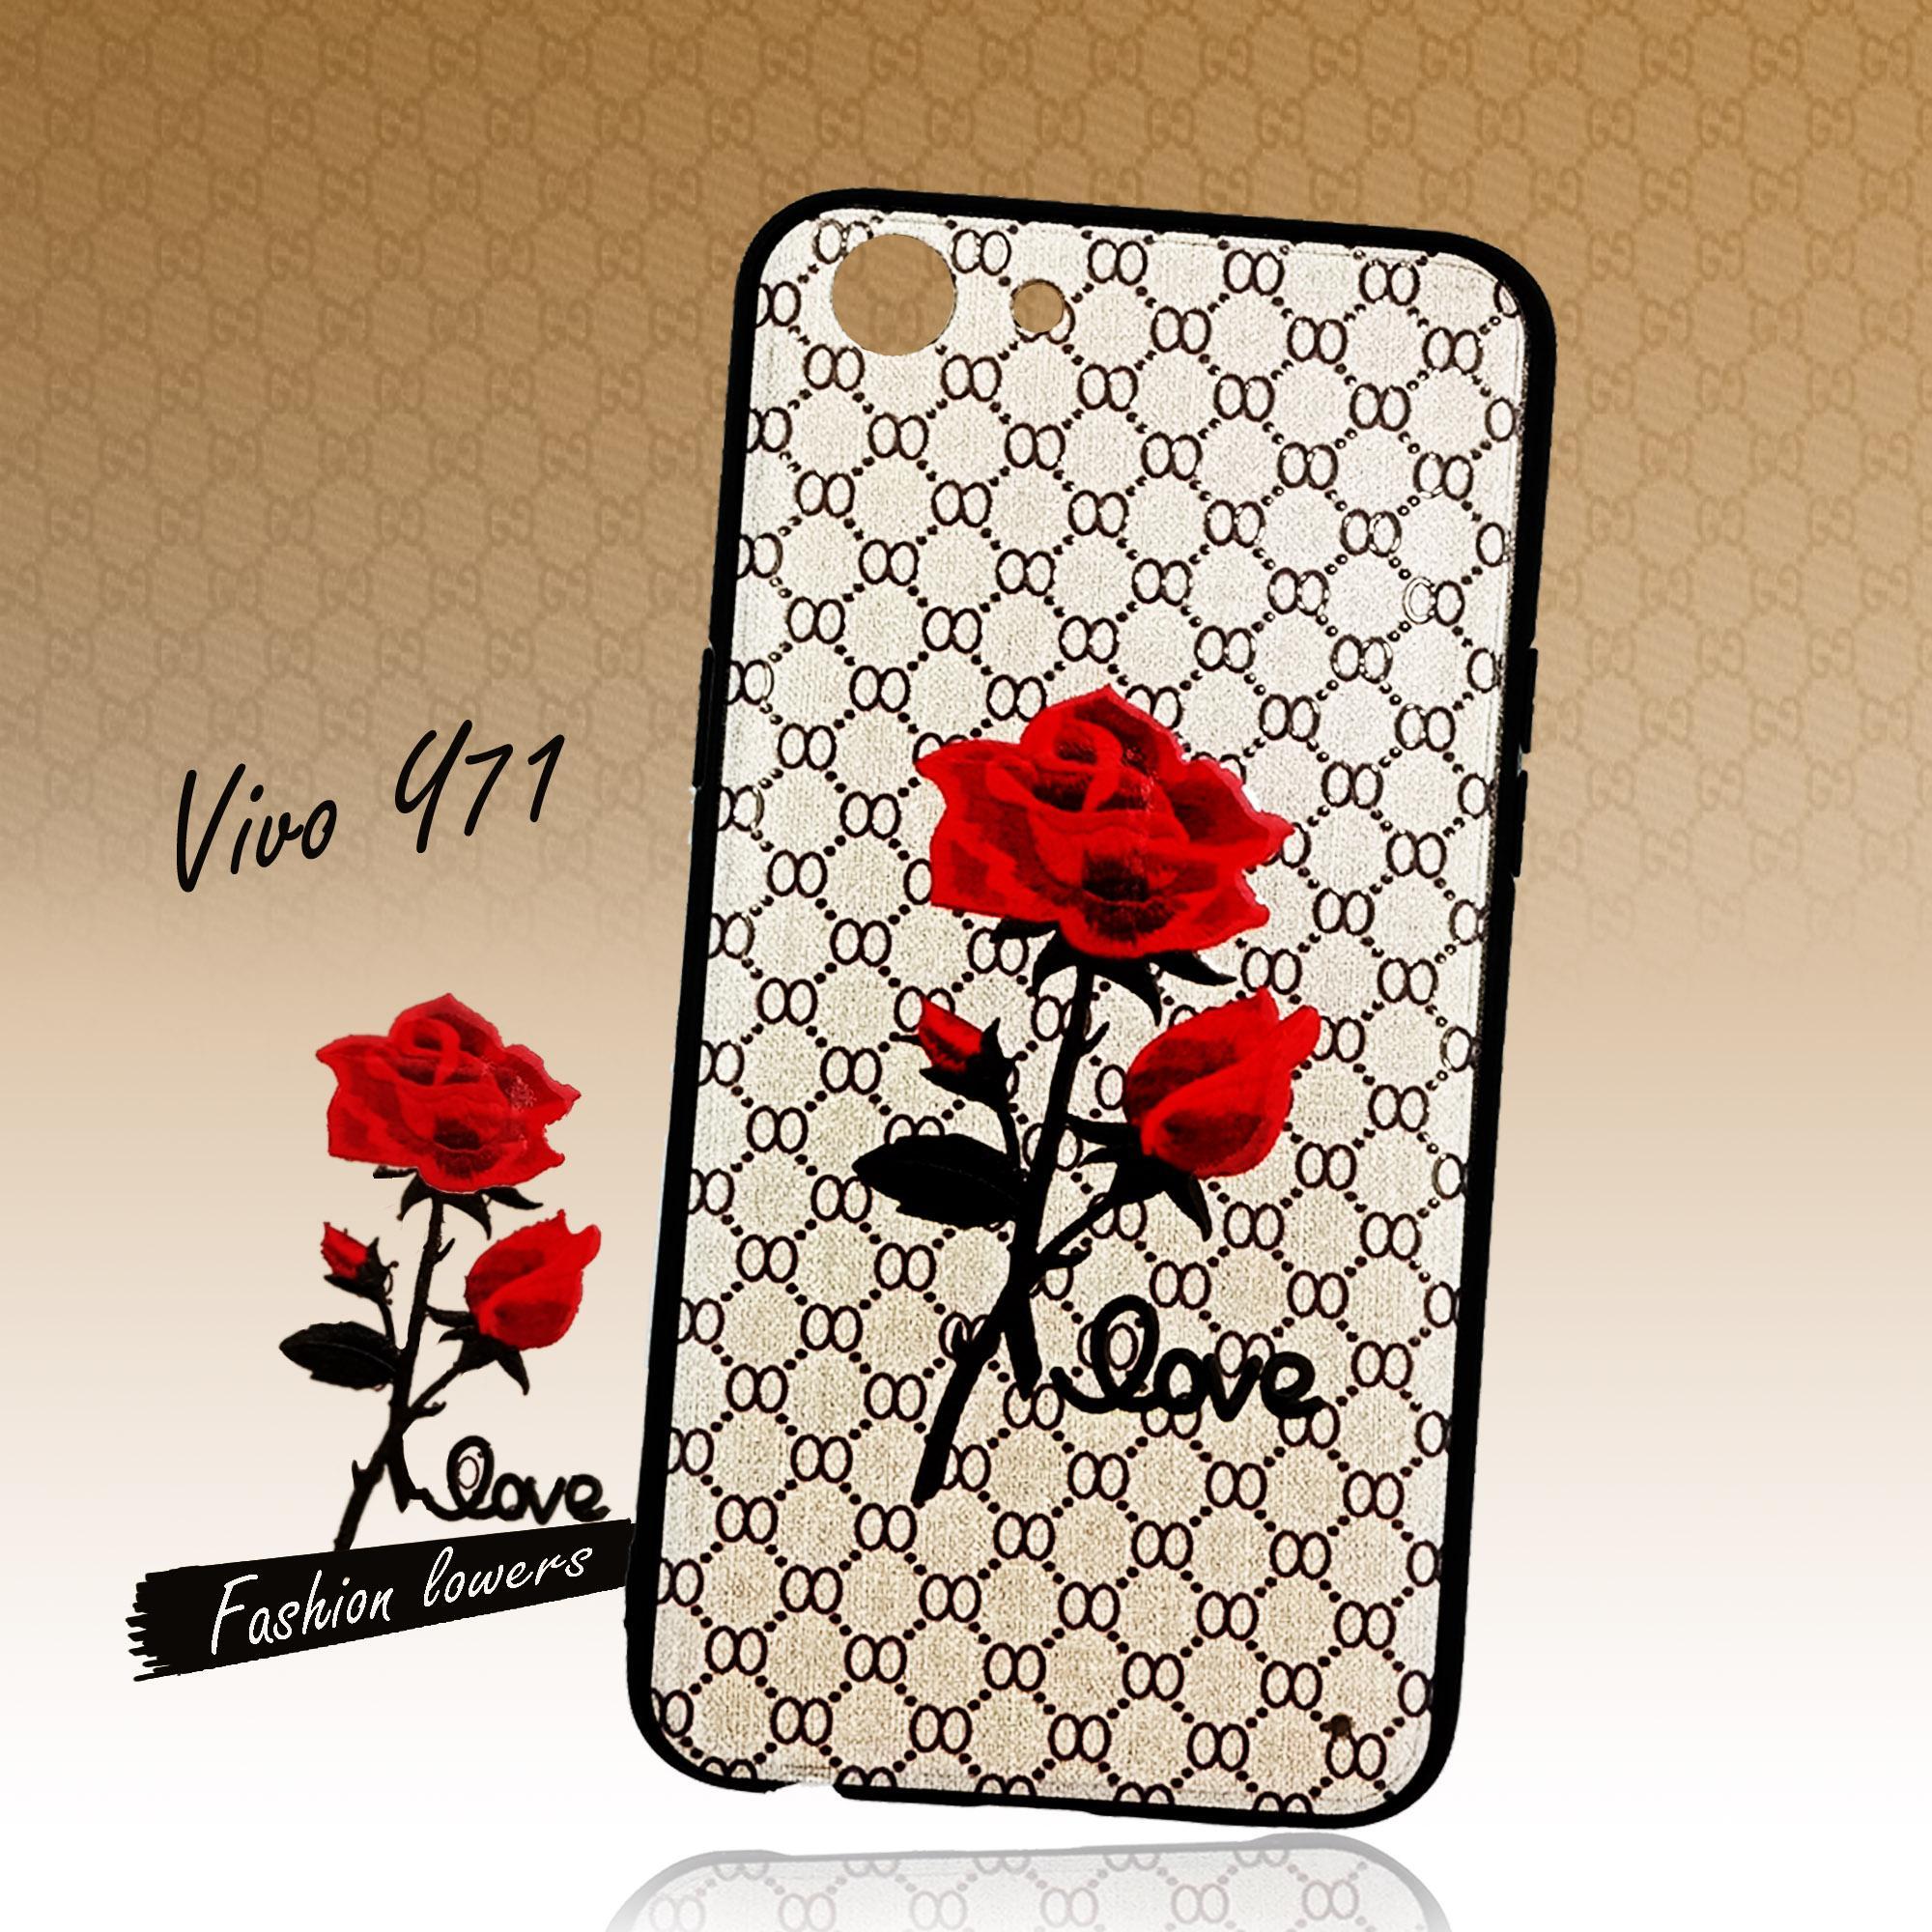 Marintri Case Vivo Y71 New Fashion Flowers